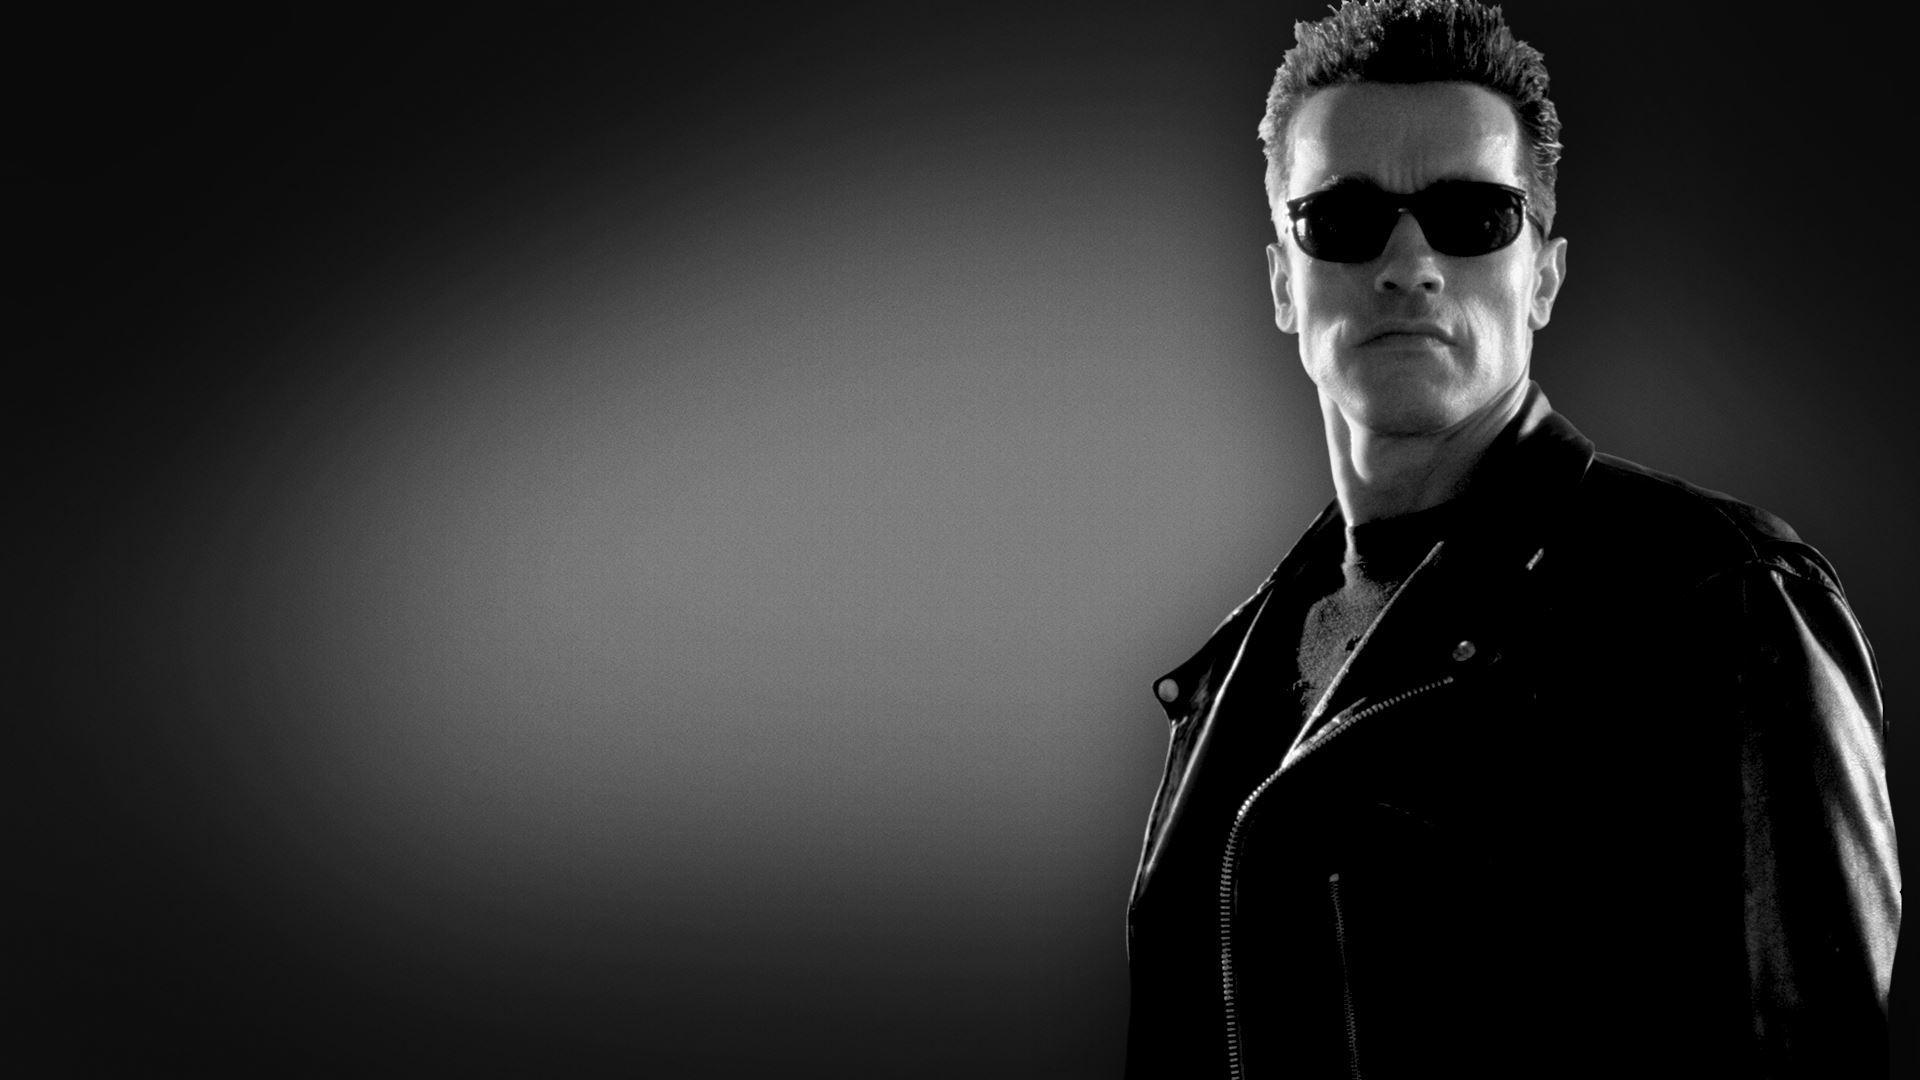 Wallpapers wwe 2k16 images - Terminator 2 wallpaper hd ...